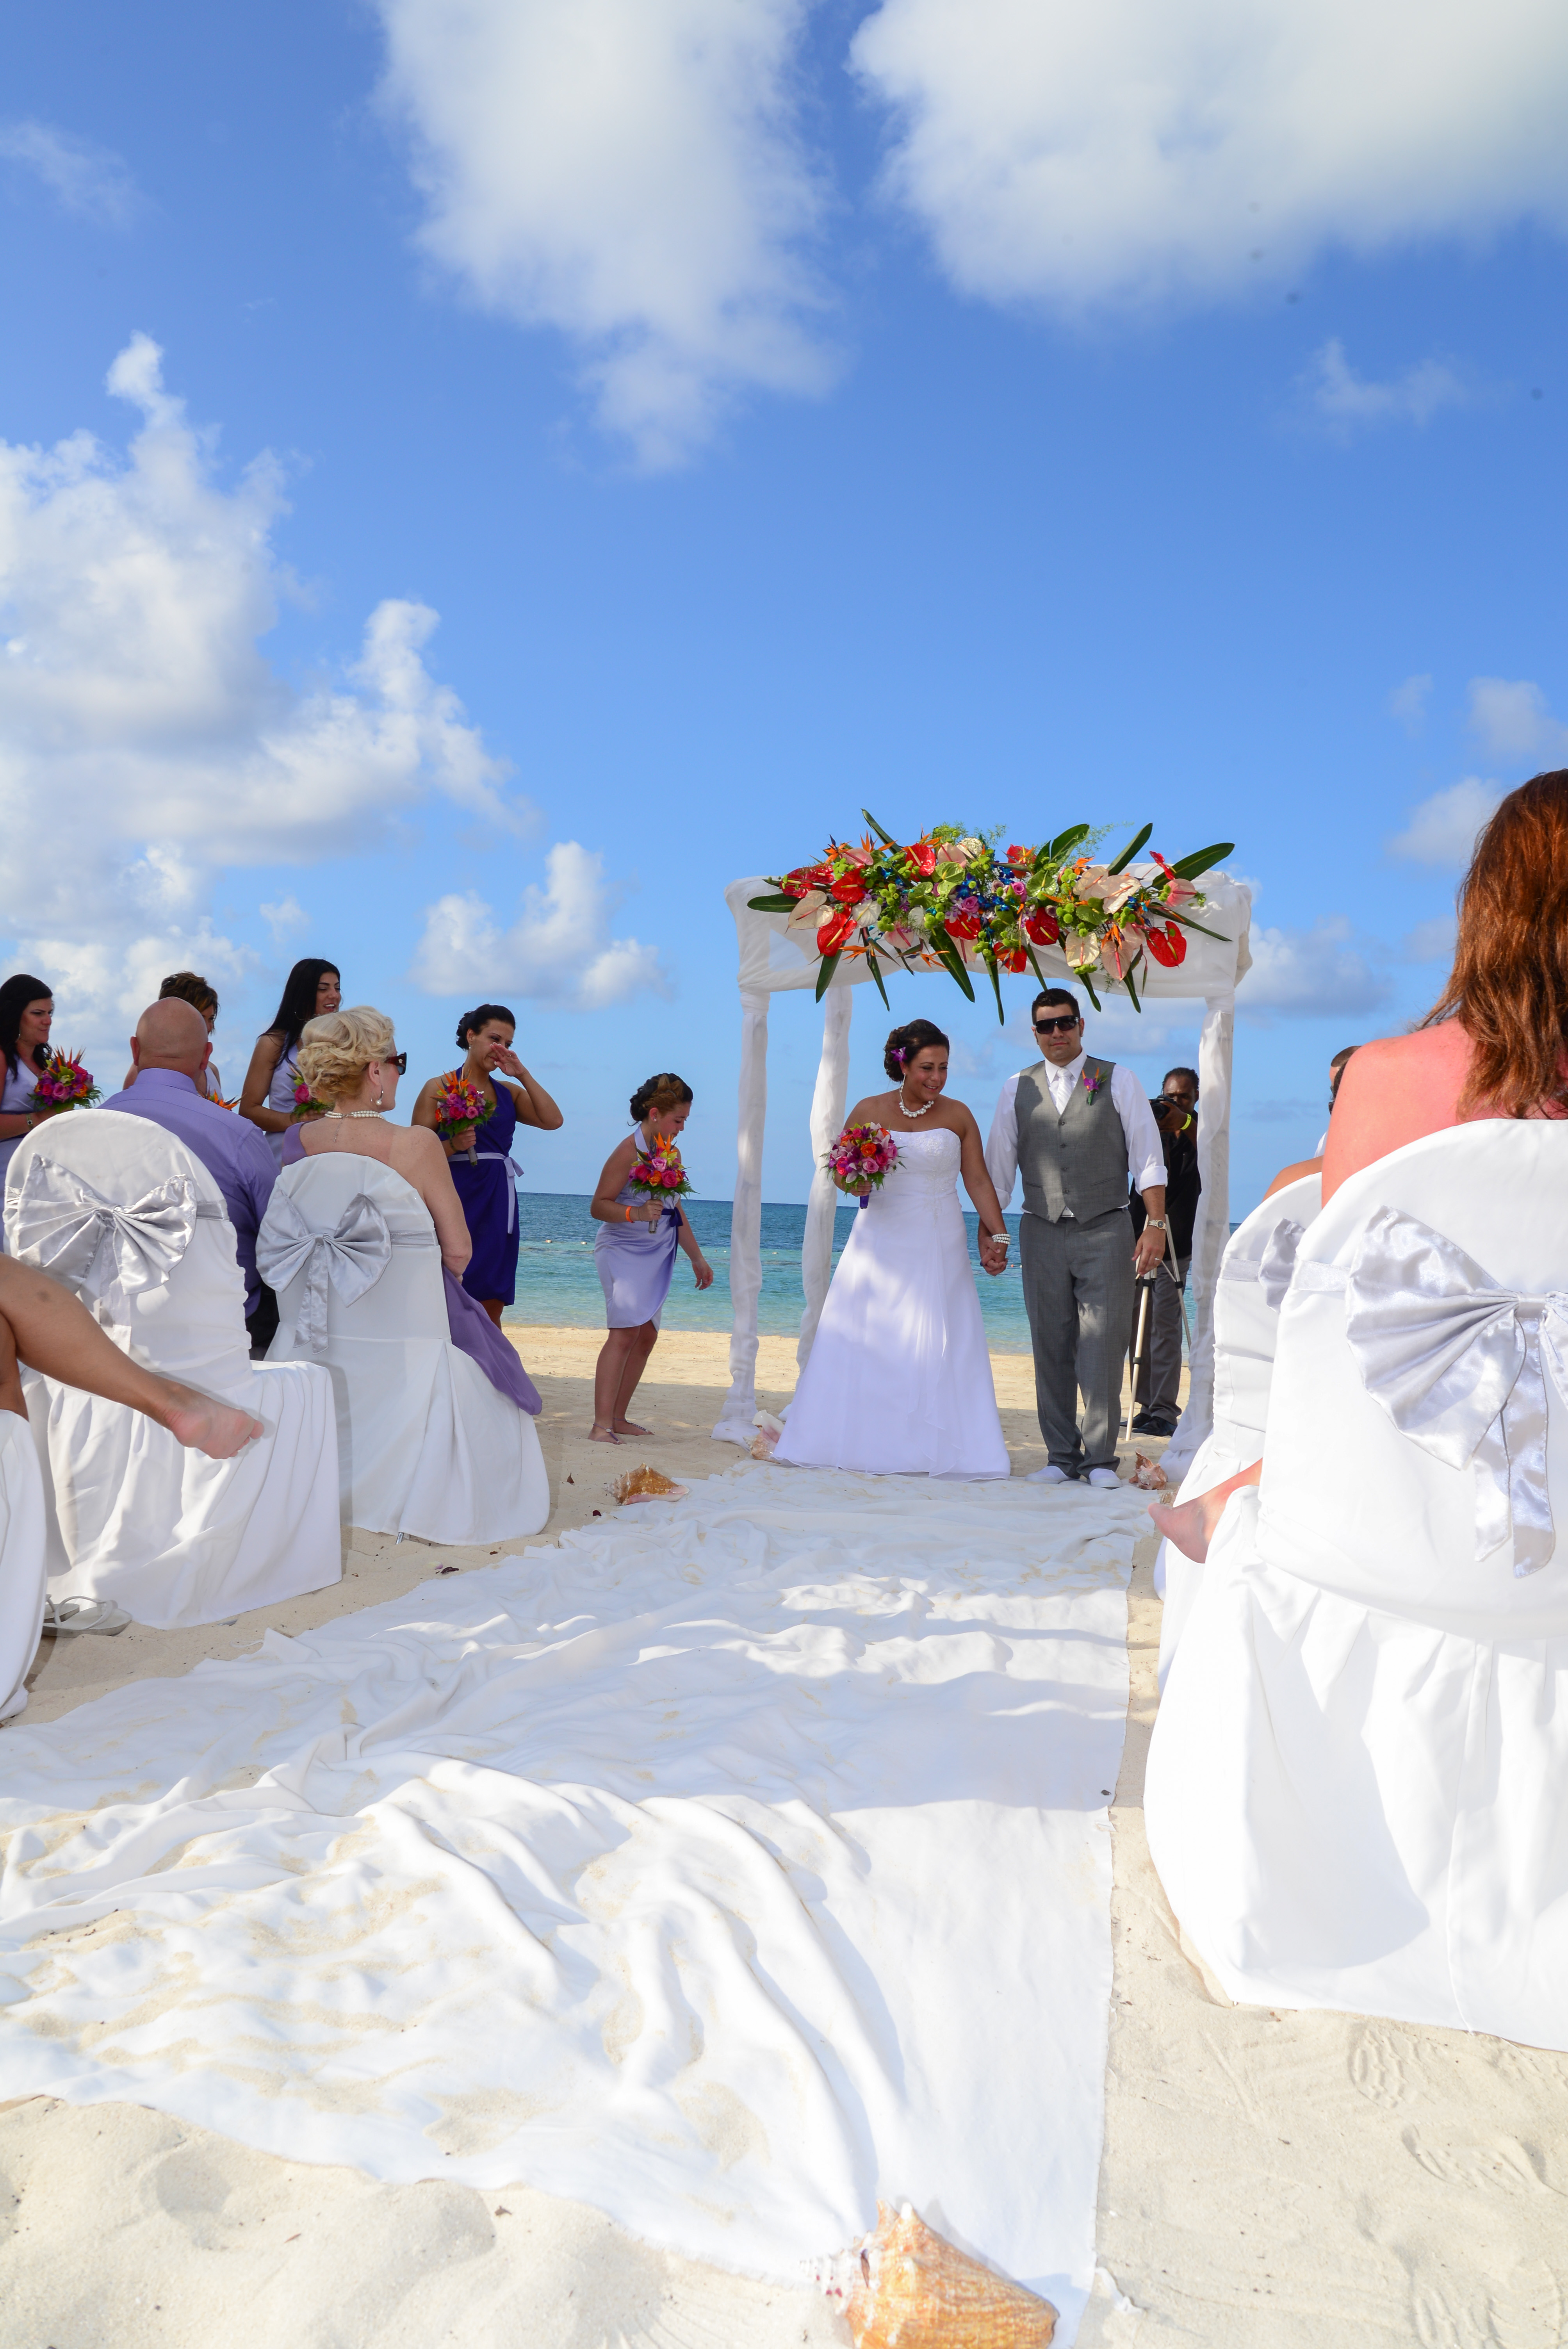 Jamaica Wedding Photos  Jamaica Wedding Photography  Jamaica Wedding Photographers